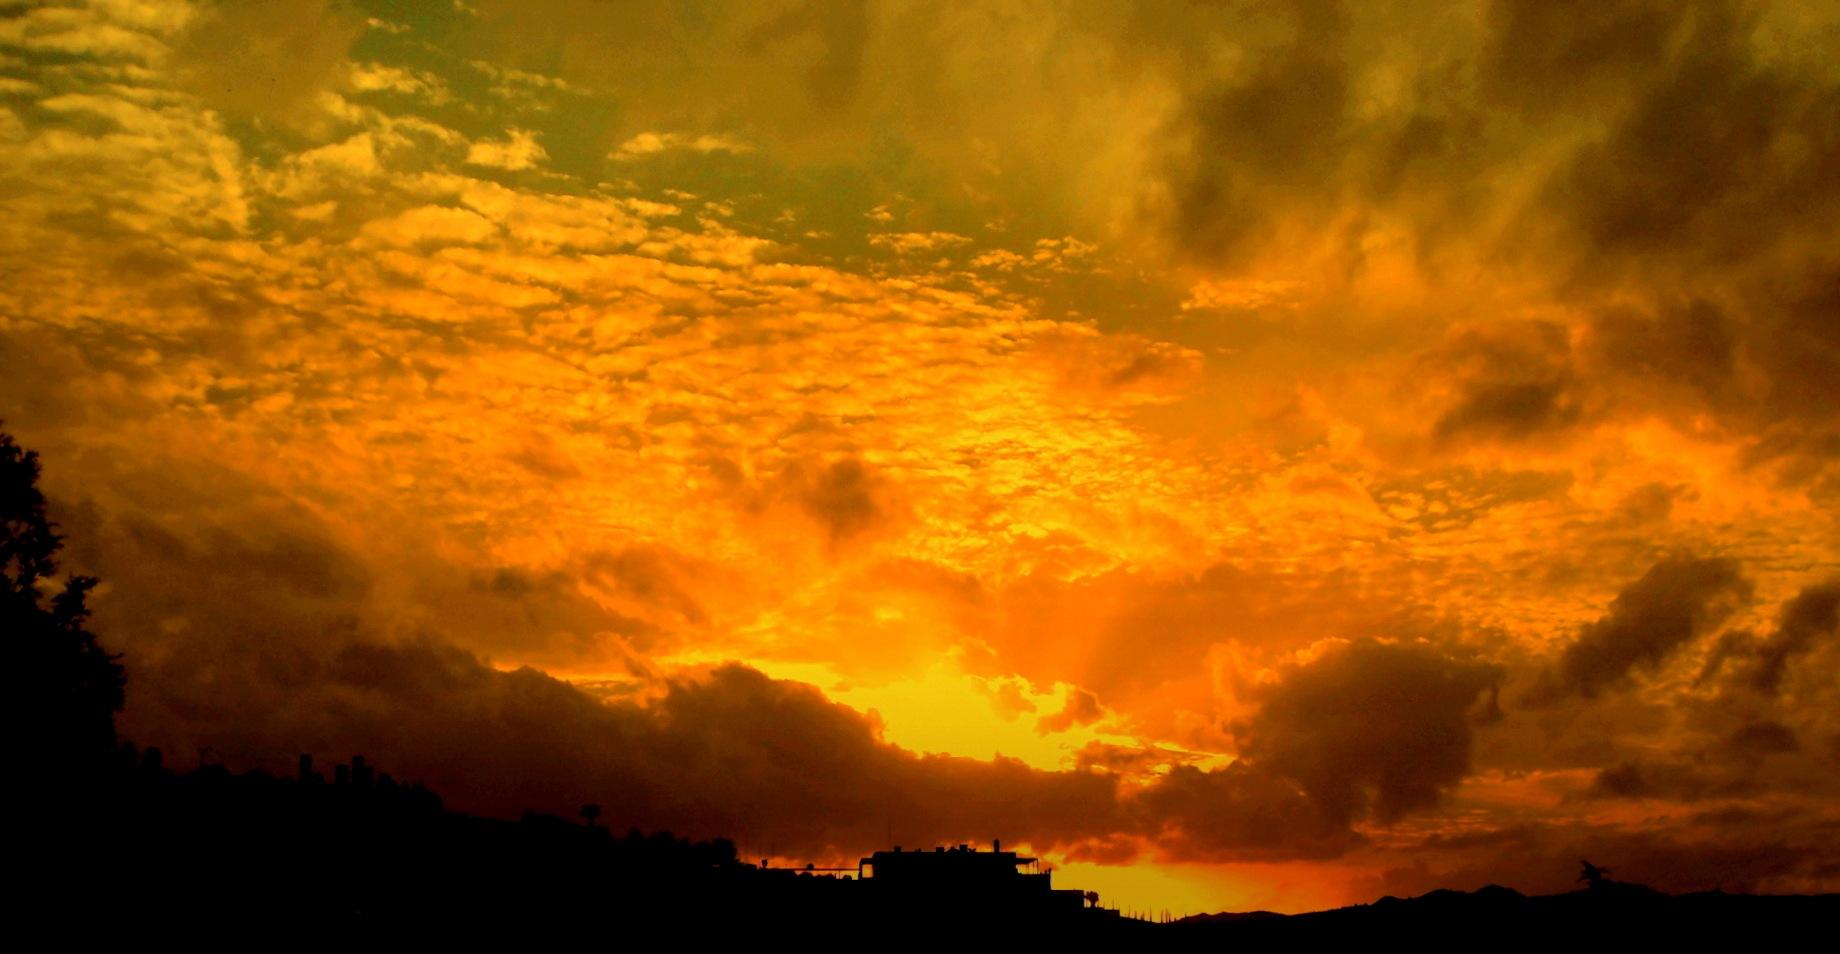 BEAUTIFUL SUNSETS 72, FULL SCREEN by Akin Saner